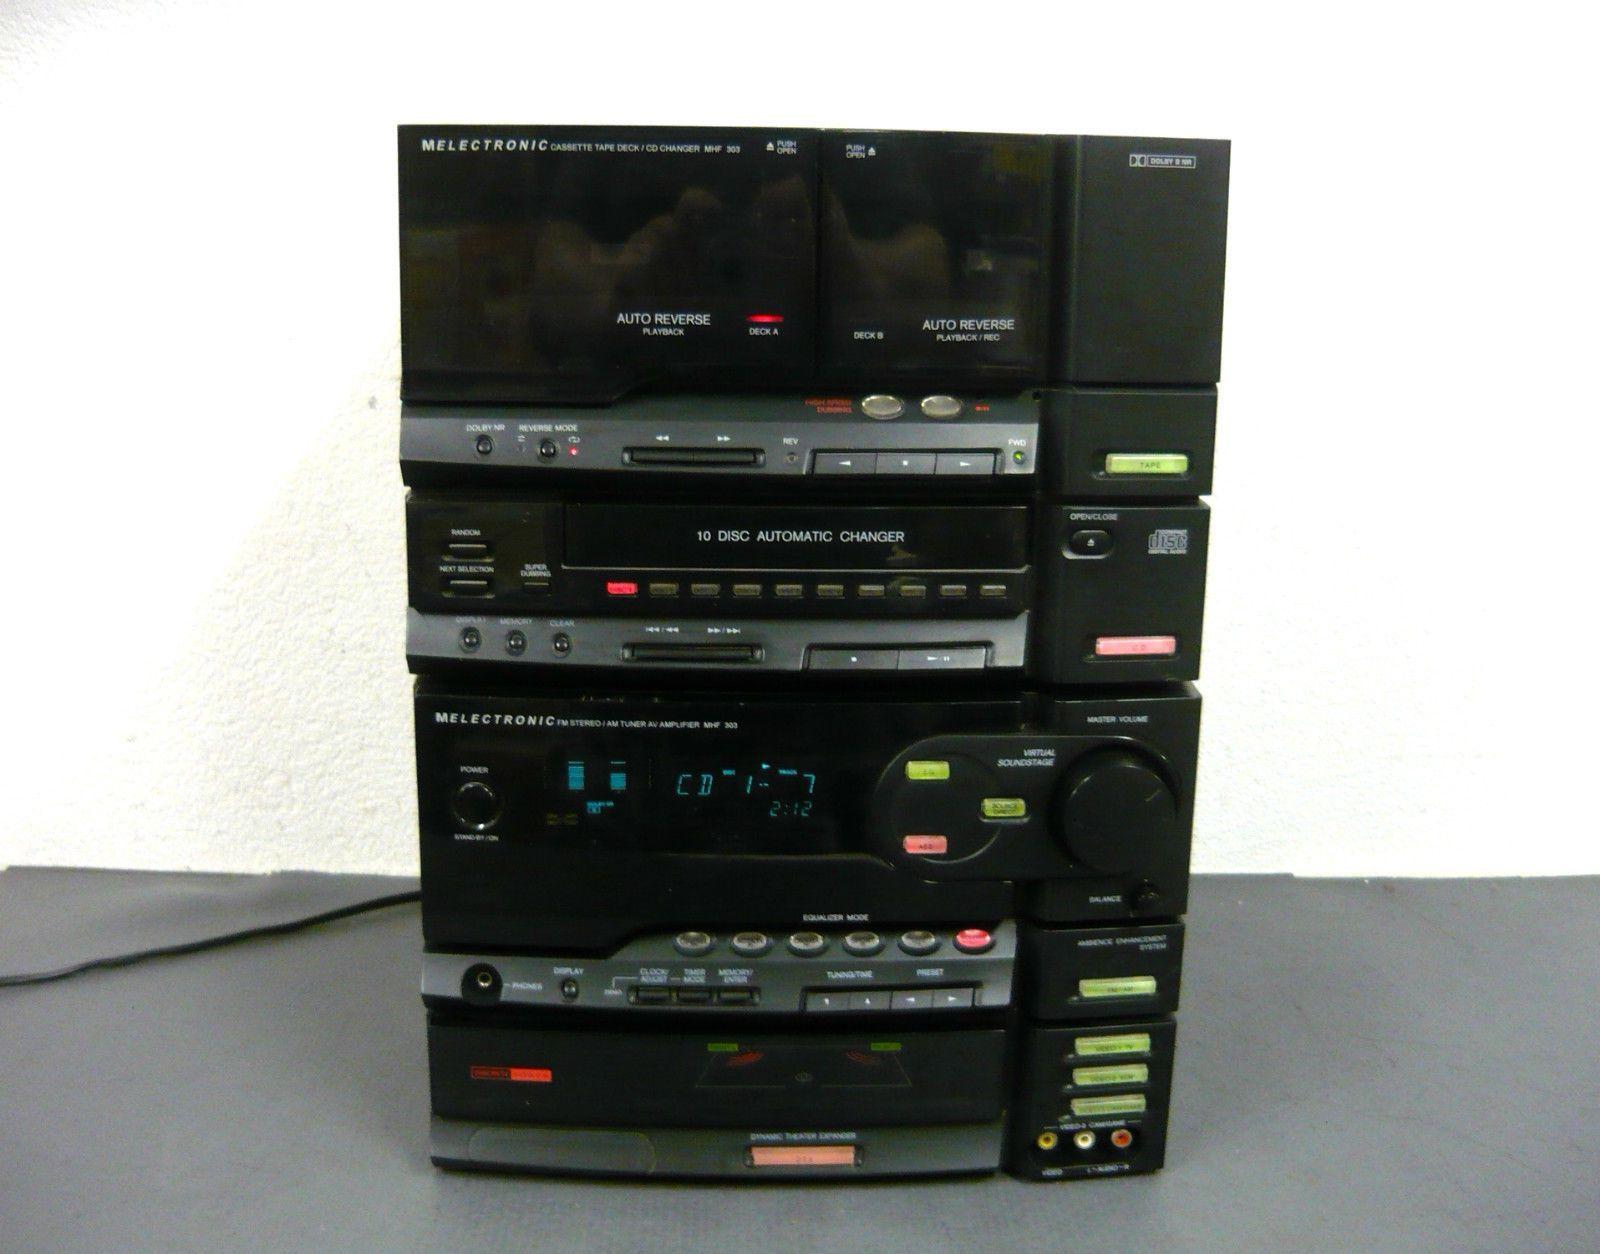 MELECTRONIC - MHF 303 - Midi Stereoanlage mit 10 DISC AUTOMATIC CHANGER de.picclick.com